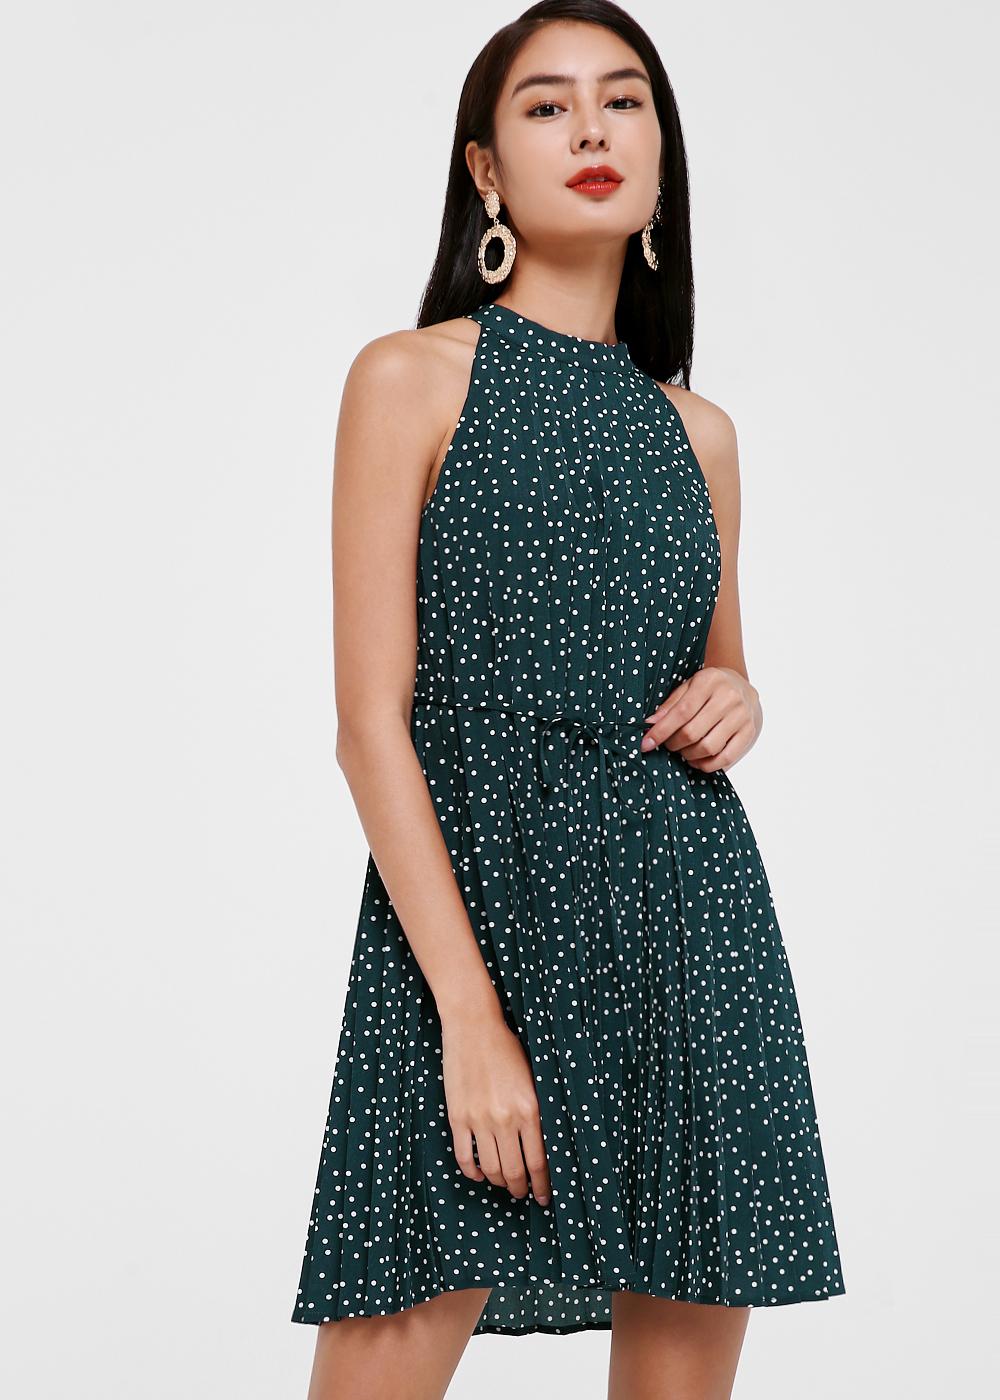 Carmen Ribbon Tie Pleated Dress in Speckled Dream